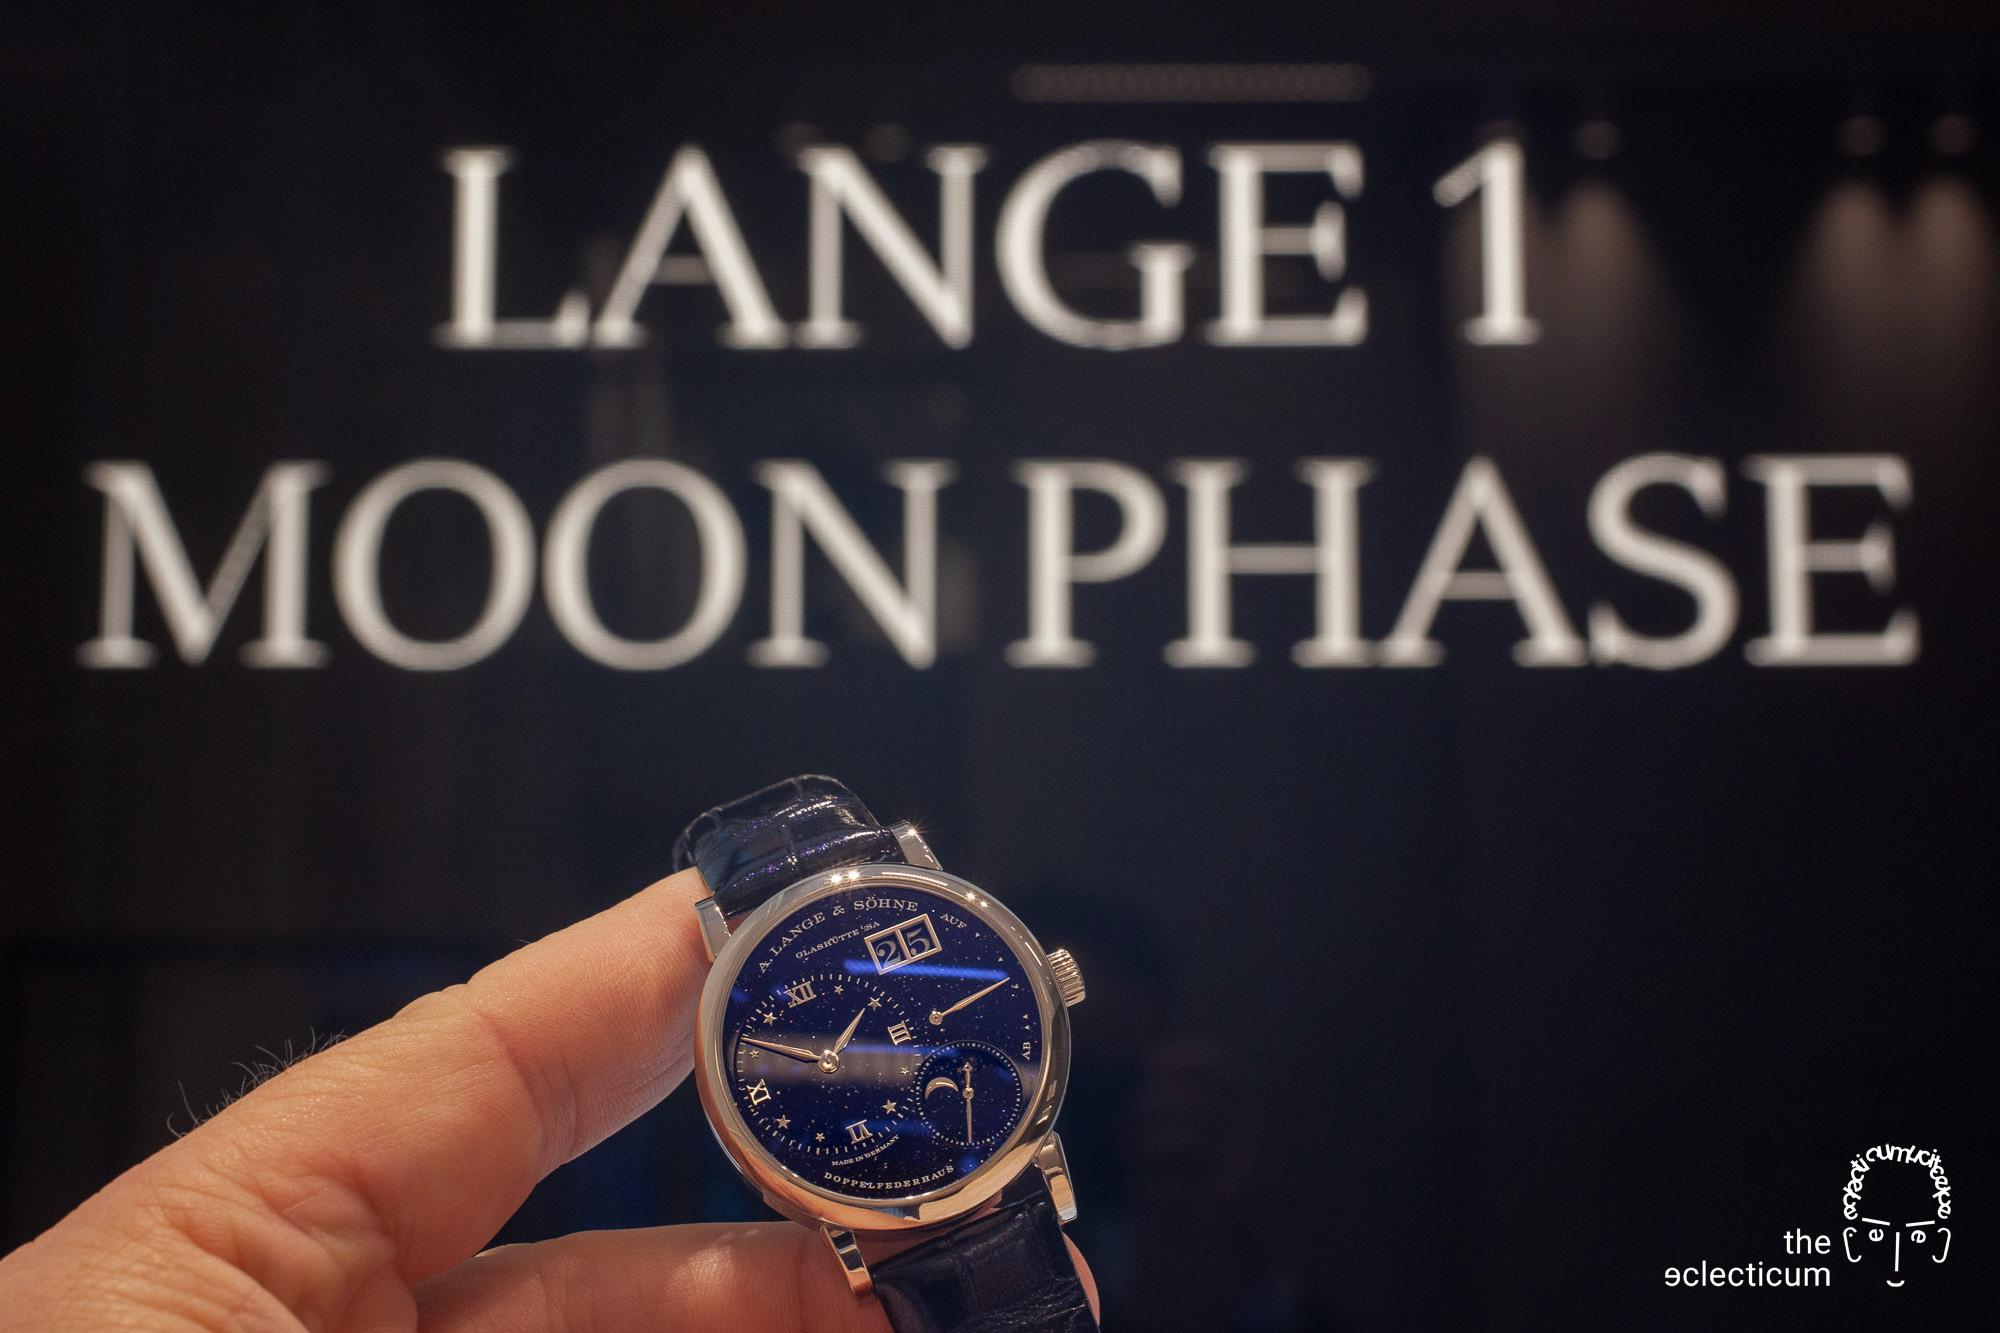 Litte Lange 1 Moon Phase